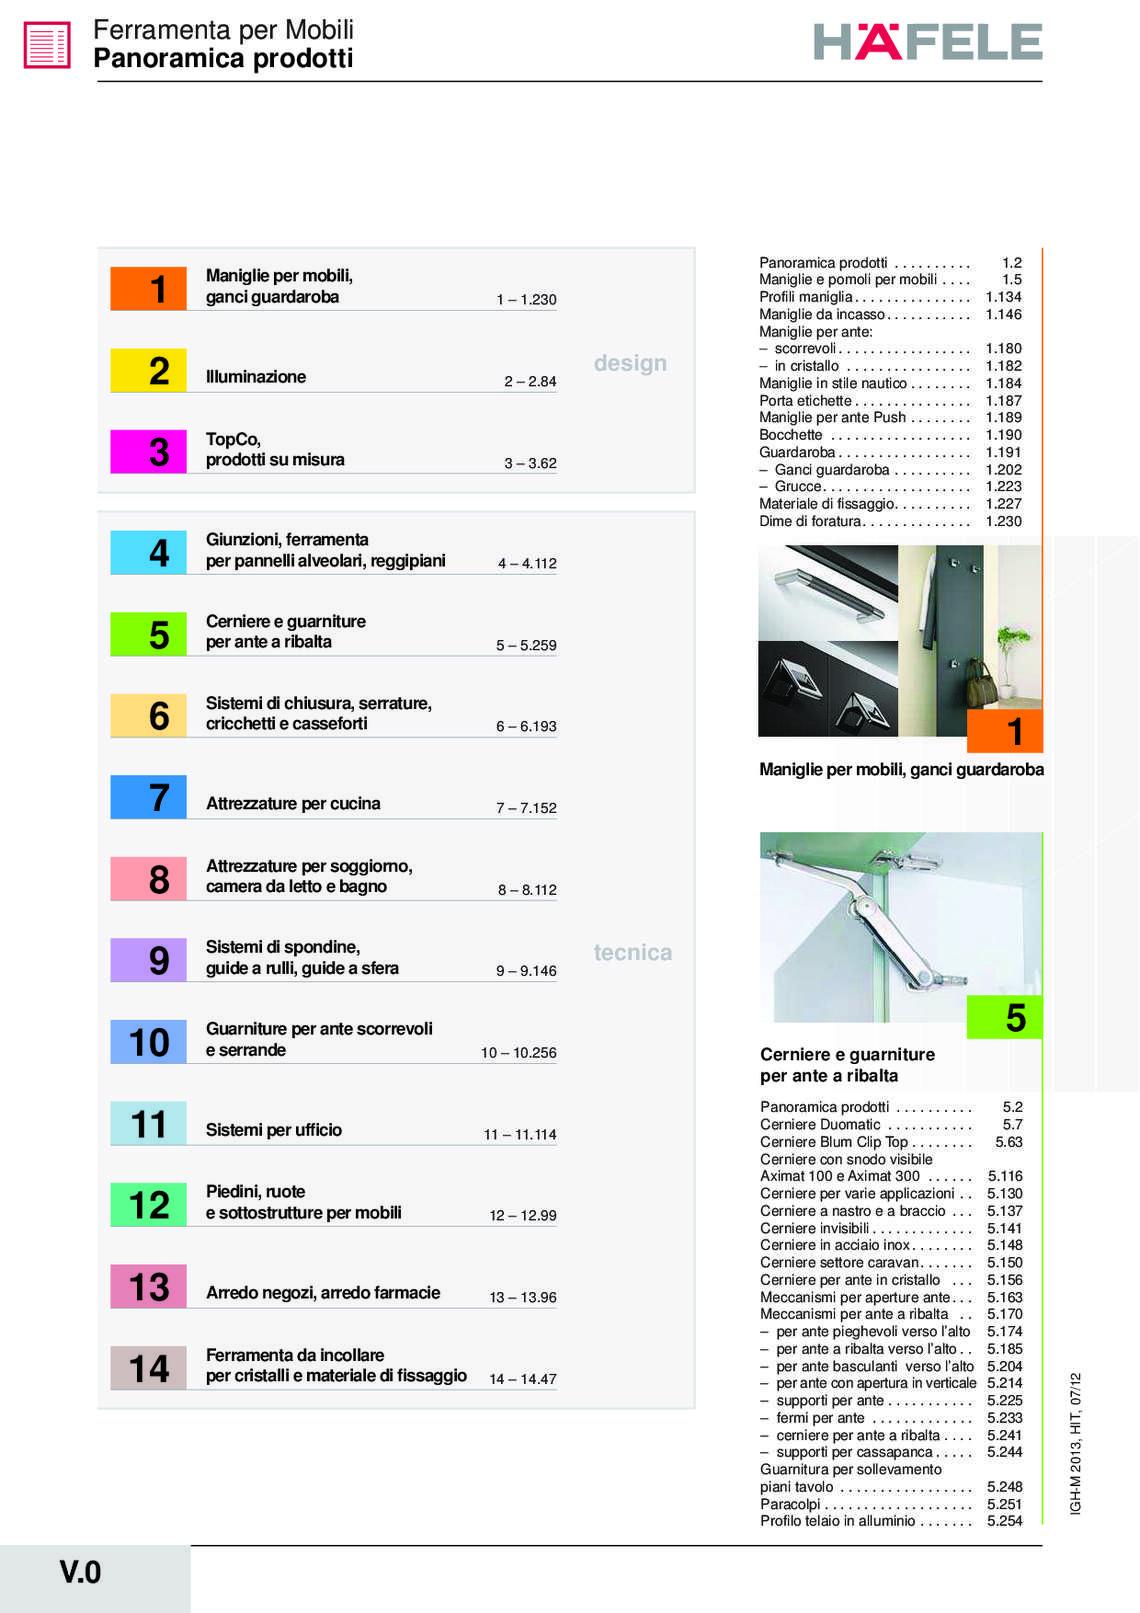 hafele-arredo-negozi-e-farmacie_32_001.jpg